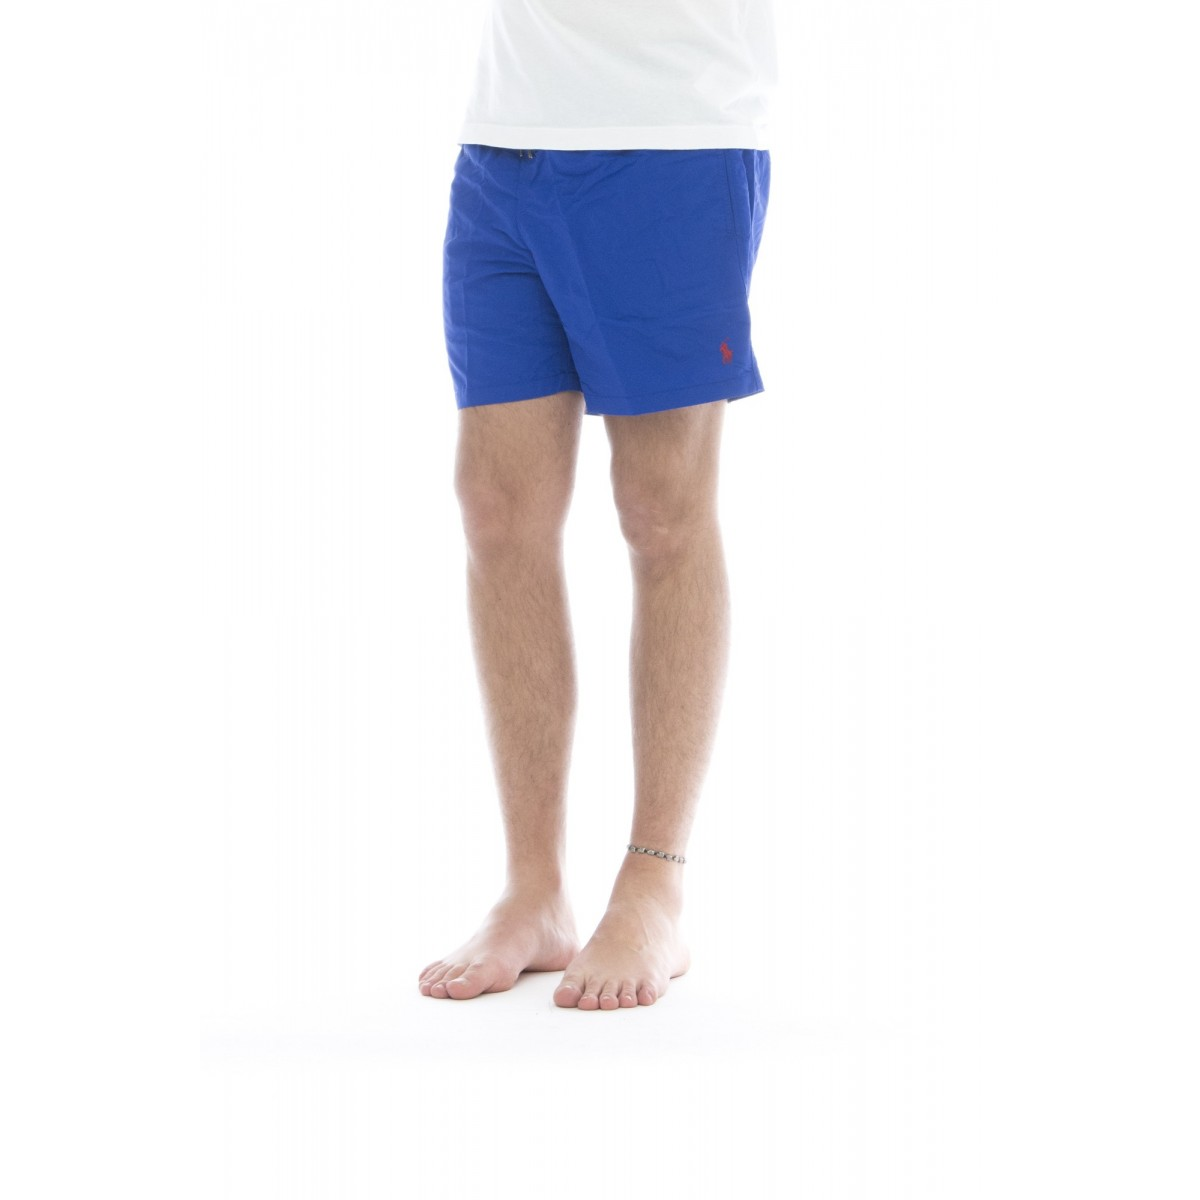 Short - 710601704 short bagno